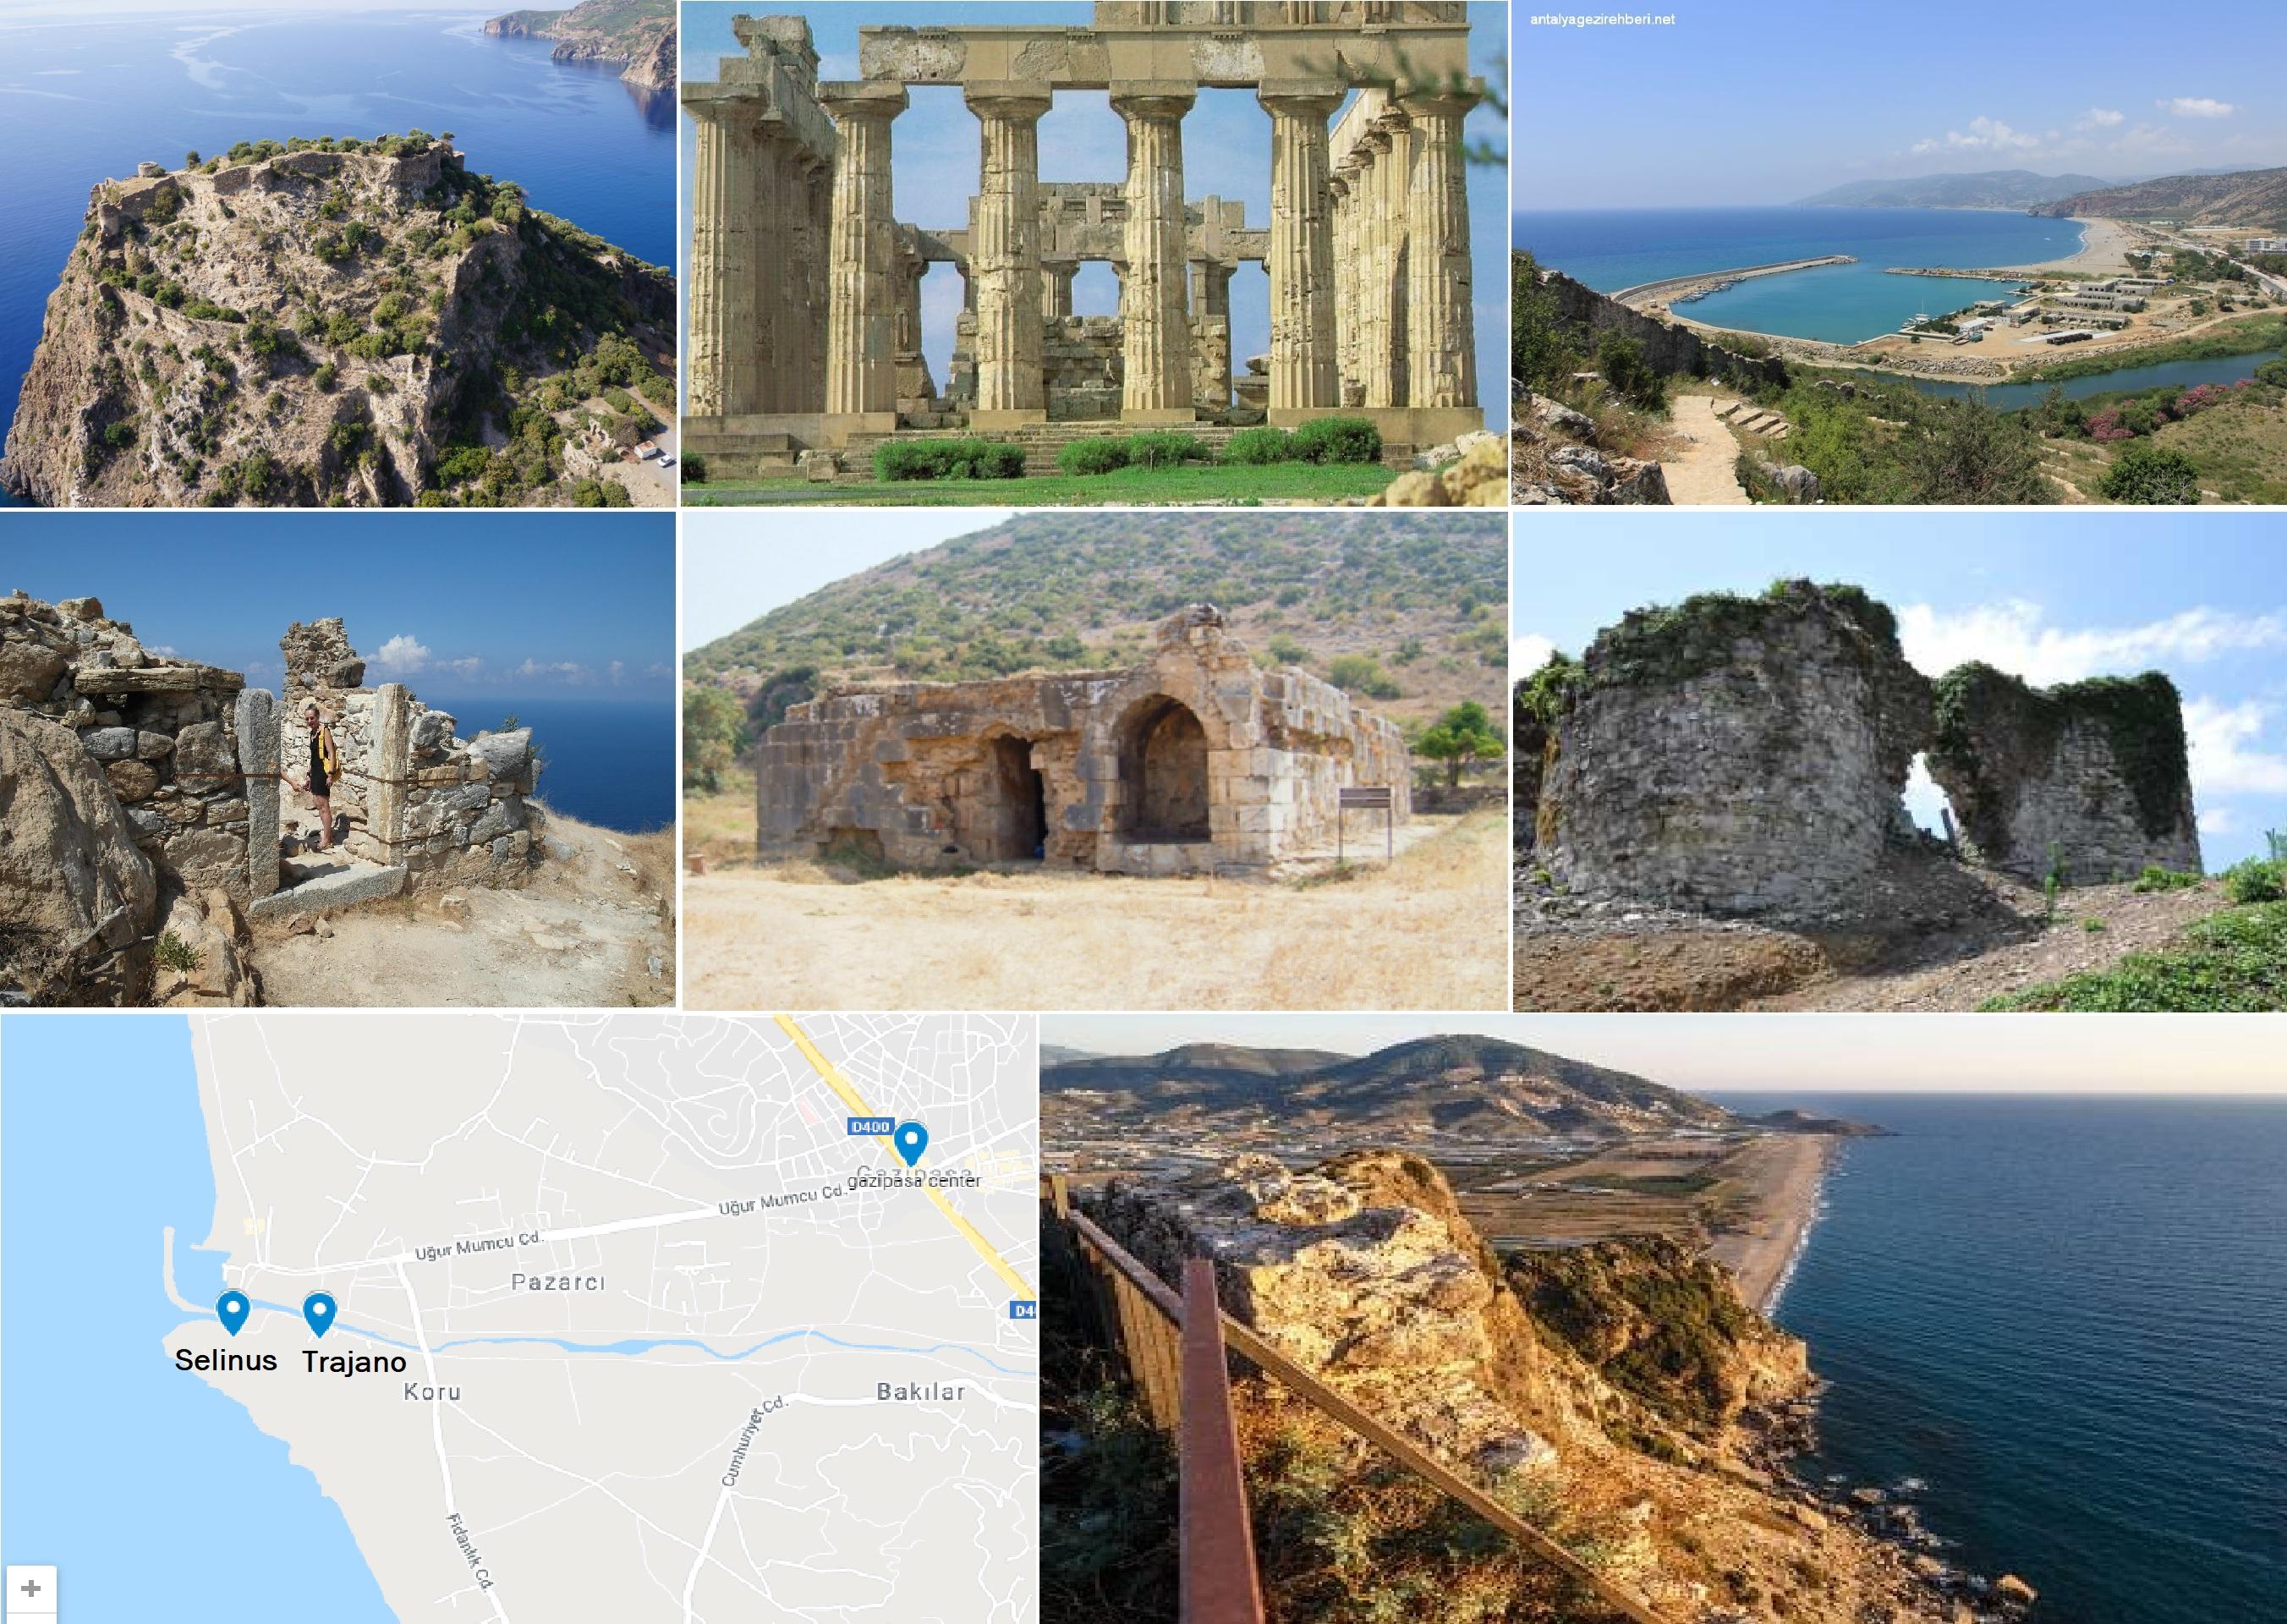 Selen/Sallune/Selinus/Trajanopolis/Castelo Lombardo/Antik Kenti – Kilikya / Antalya – Gazipaşa